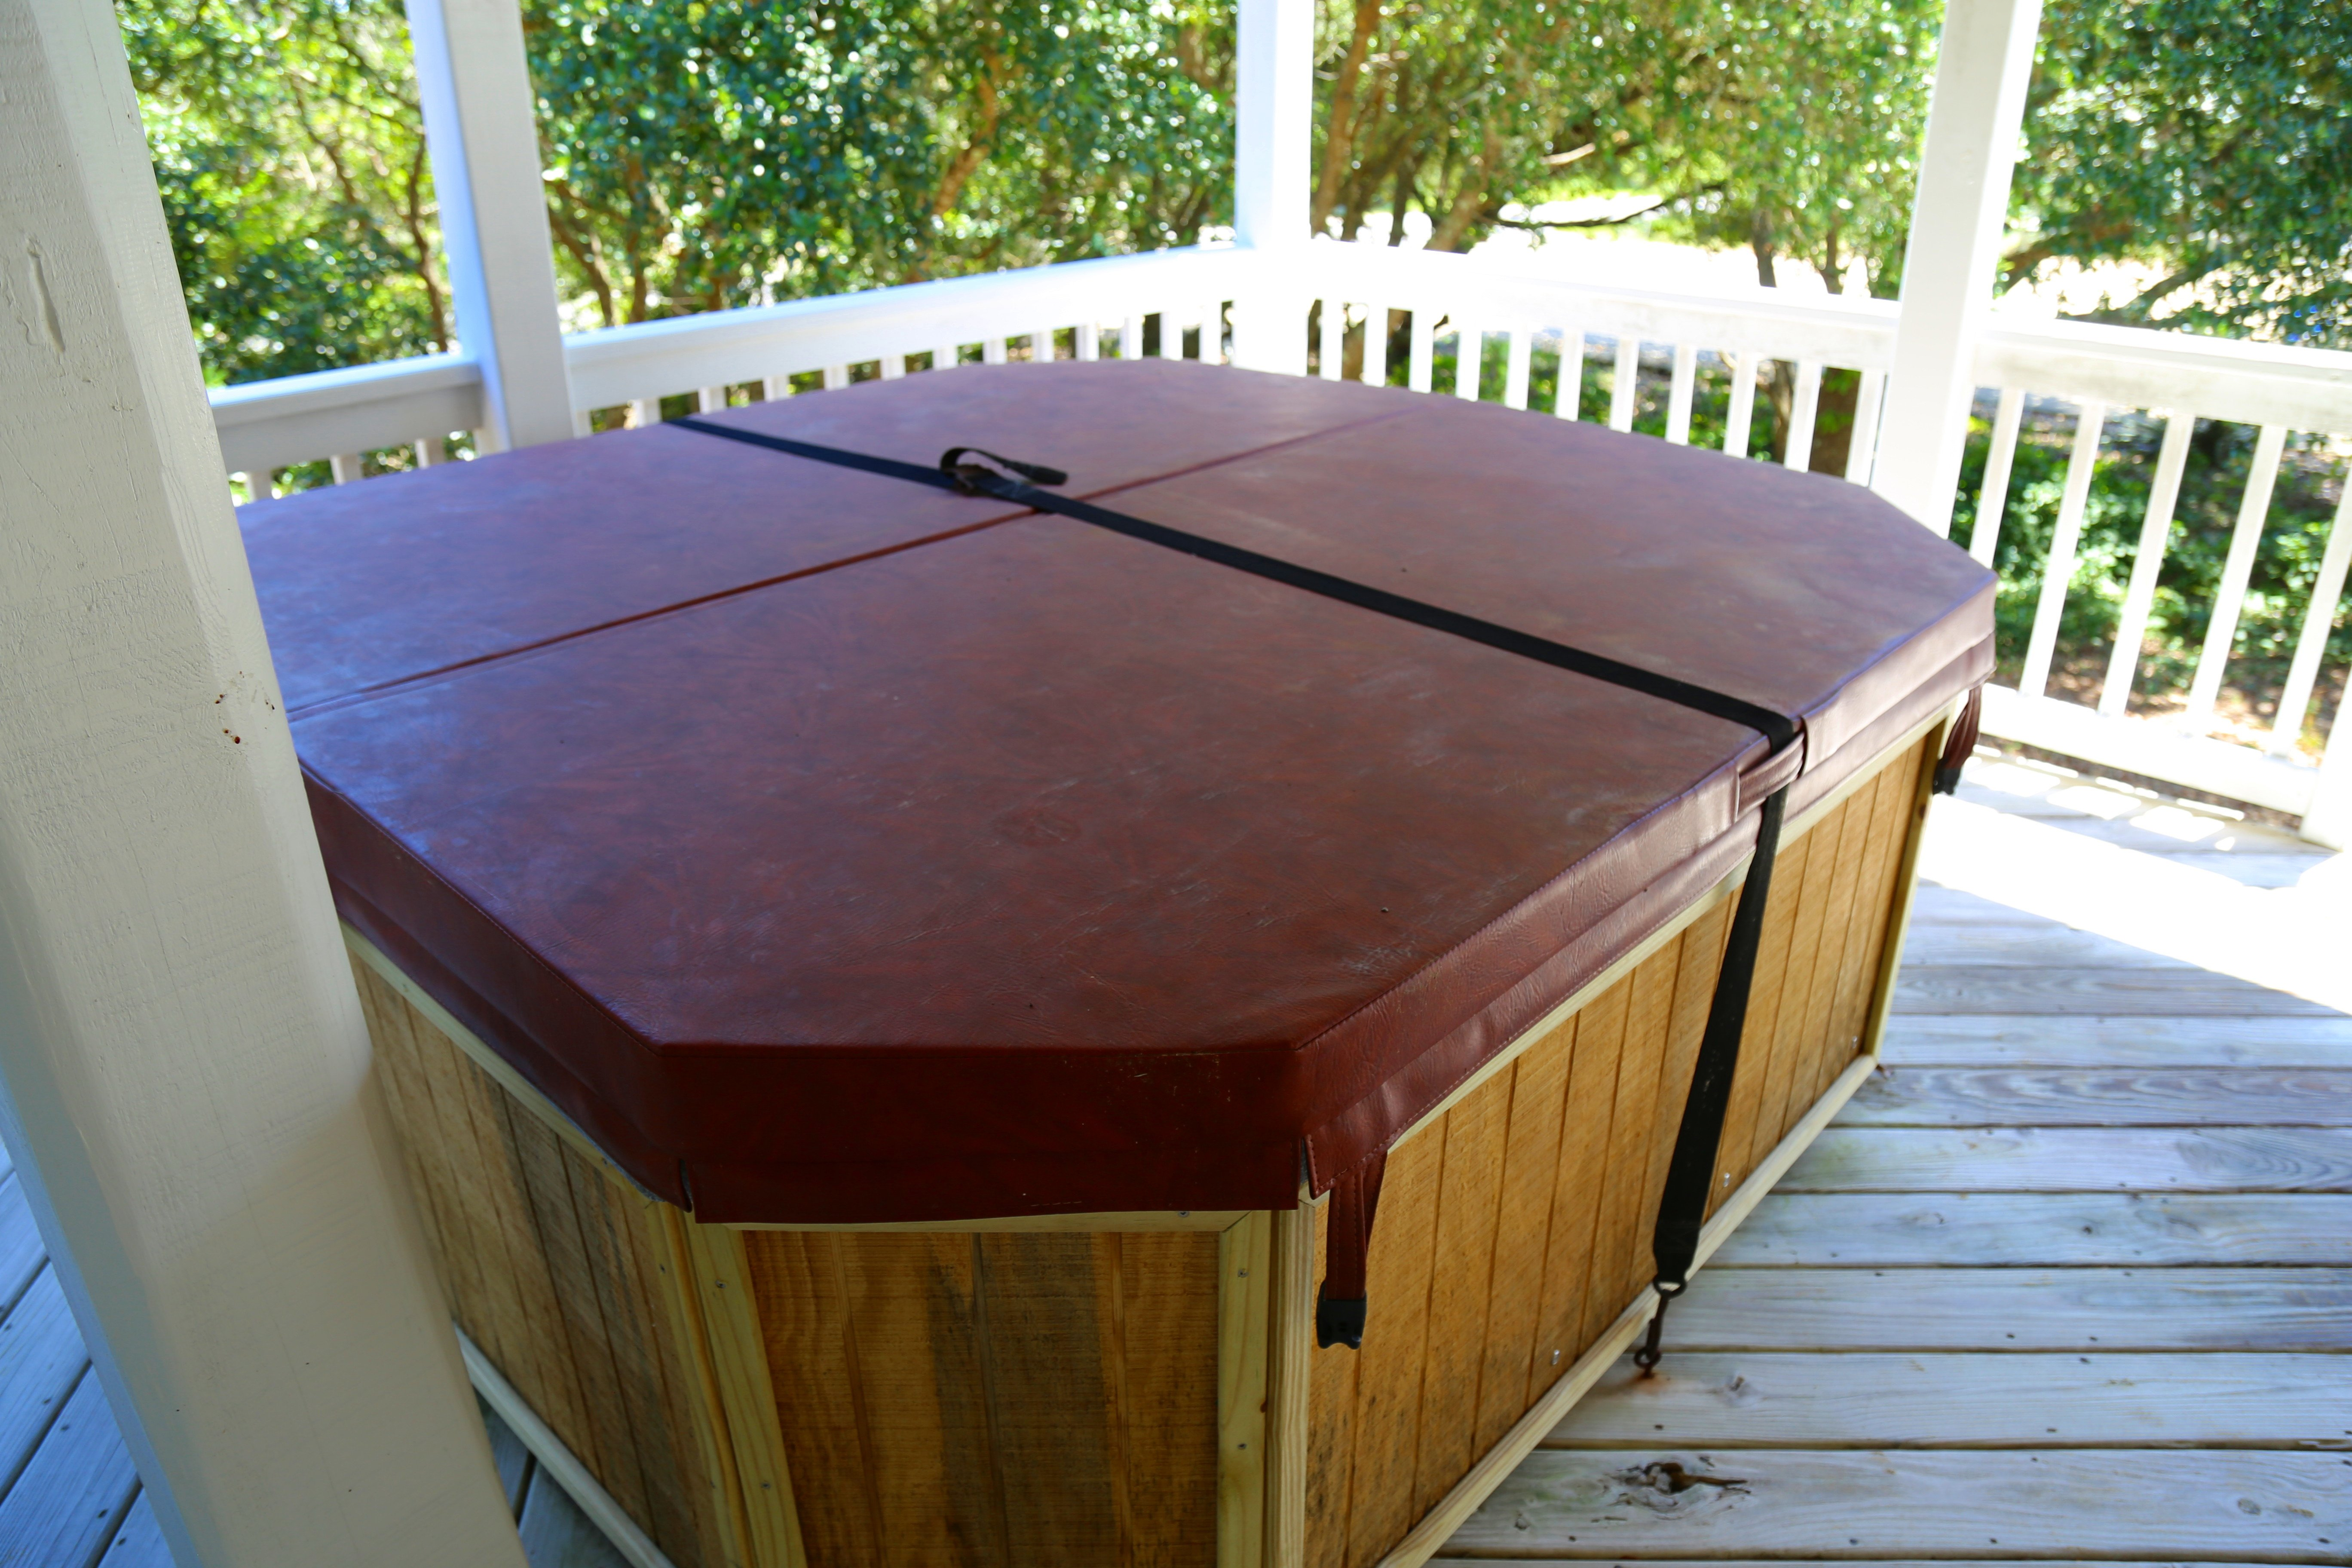 Crofton Electrician Hot Tub Install